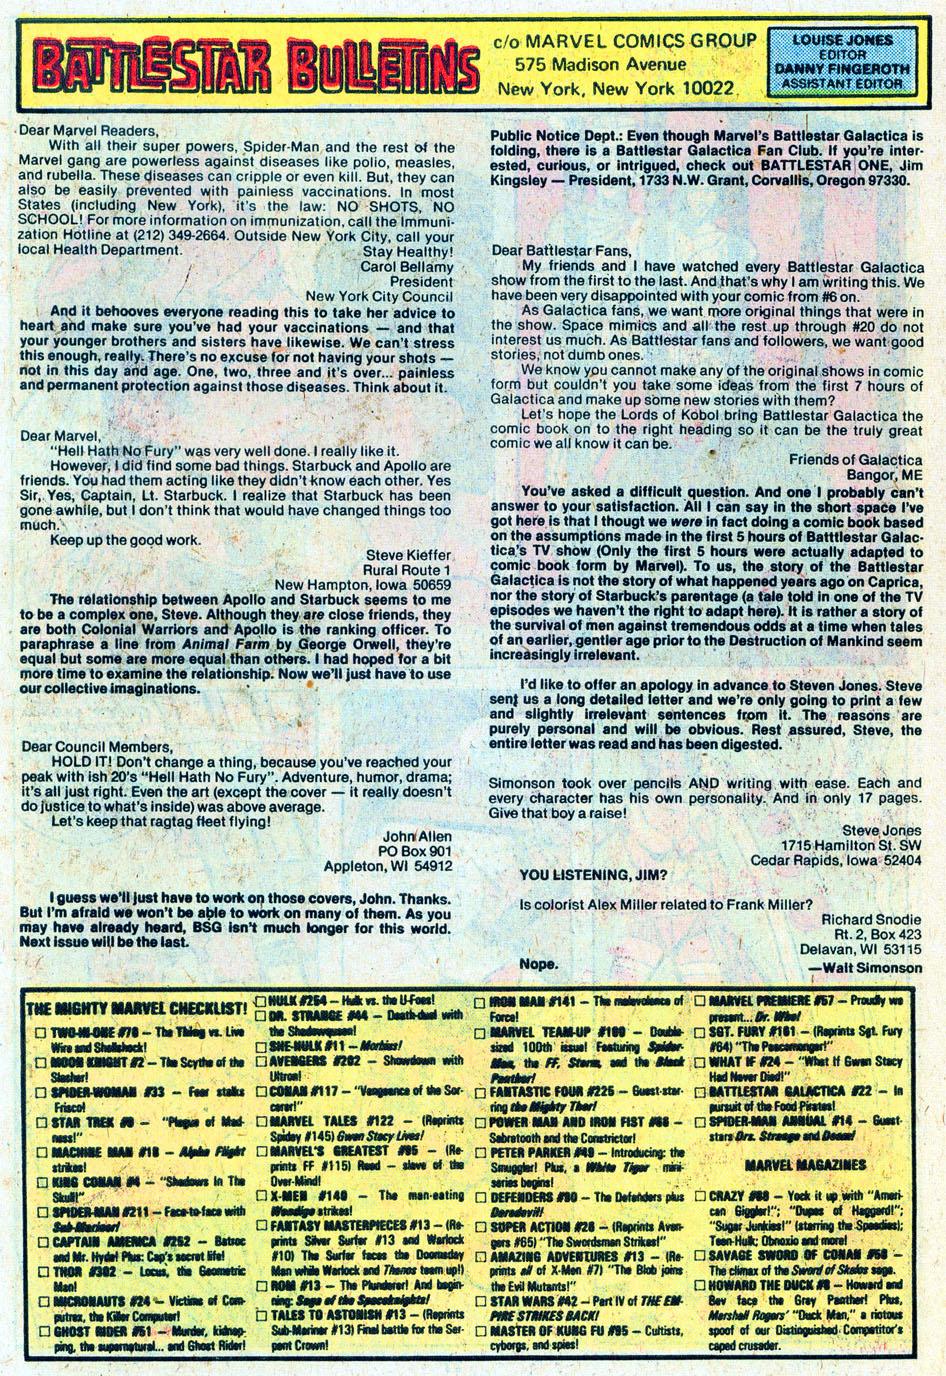 Battlestar Galactica 22 Page 24